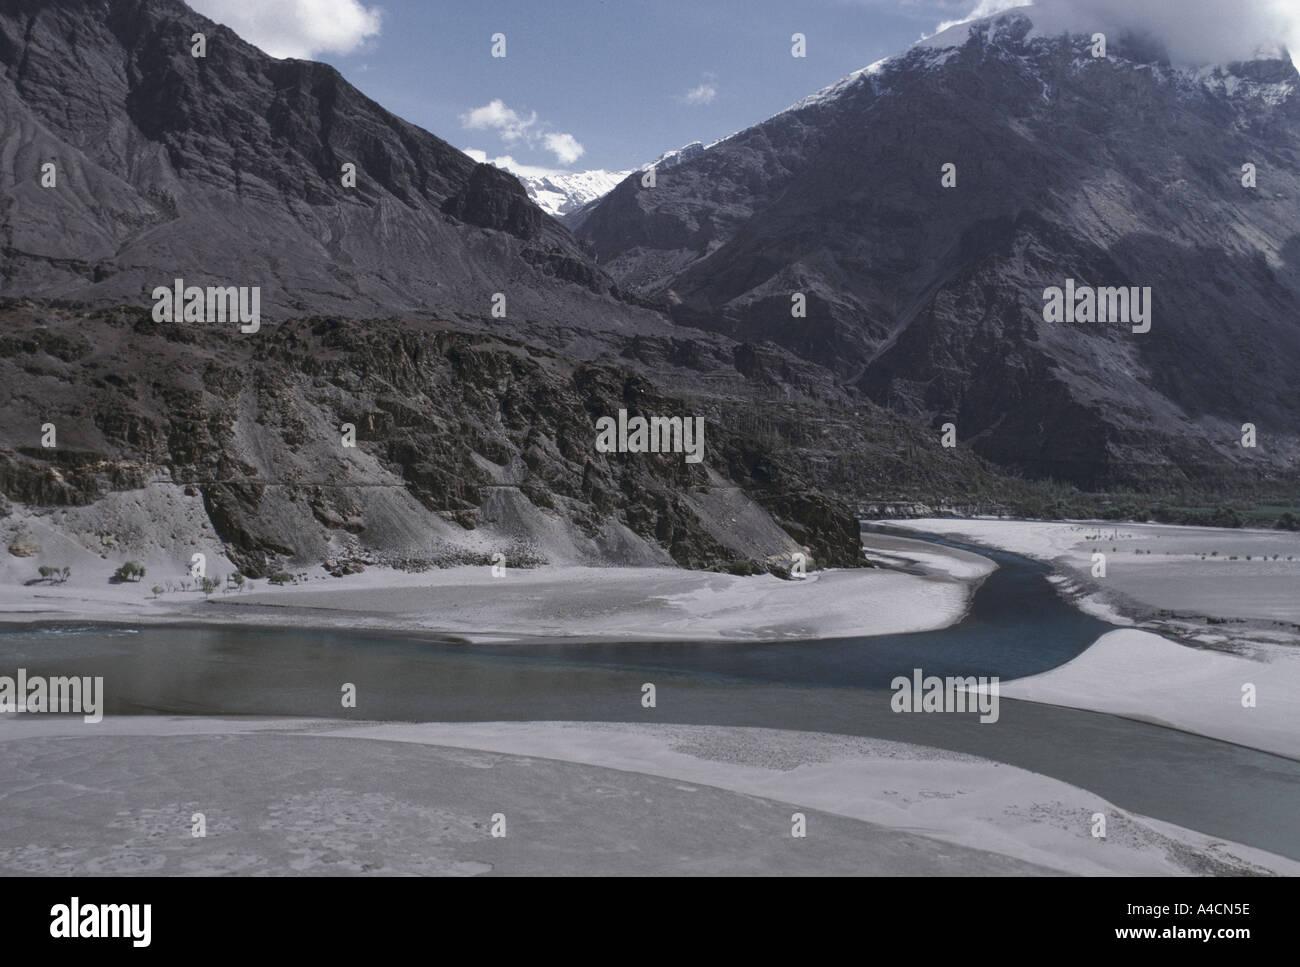 The Indus River winds along its valley floor near Skardu, upper Indus Valley, Pakistan, 1990 - Stock Image